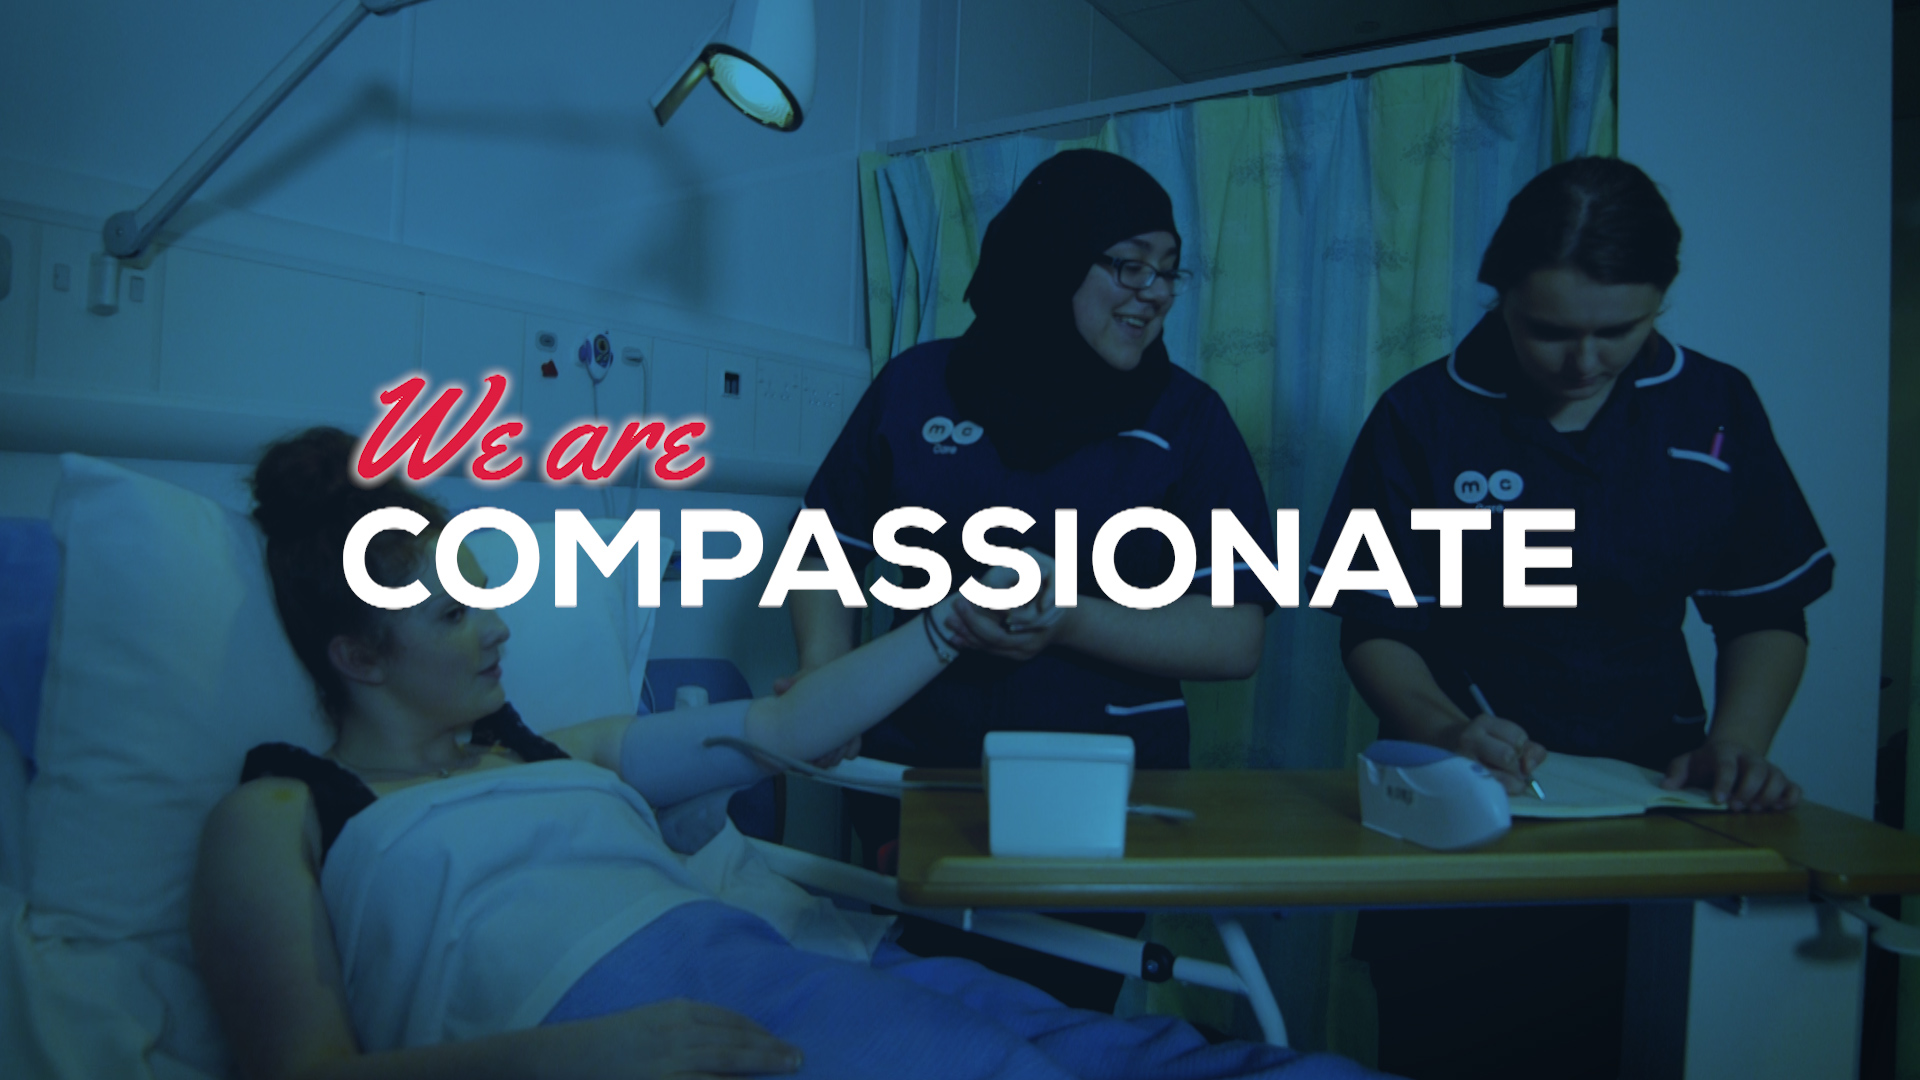 We are compassionate